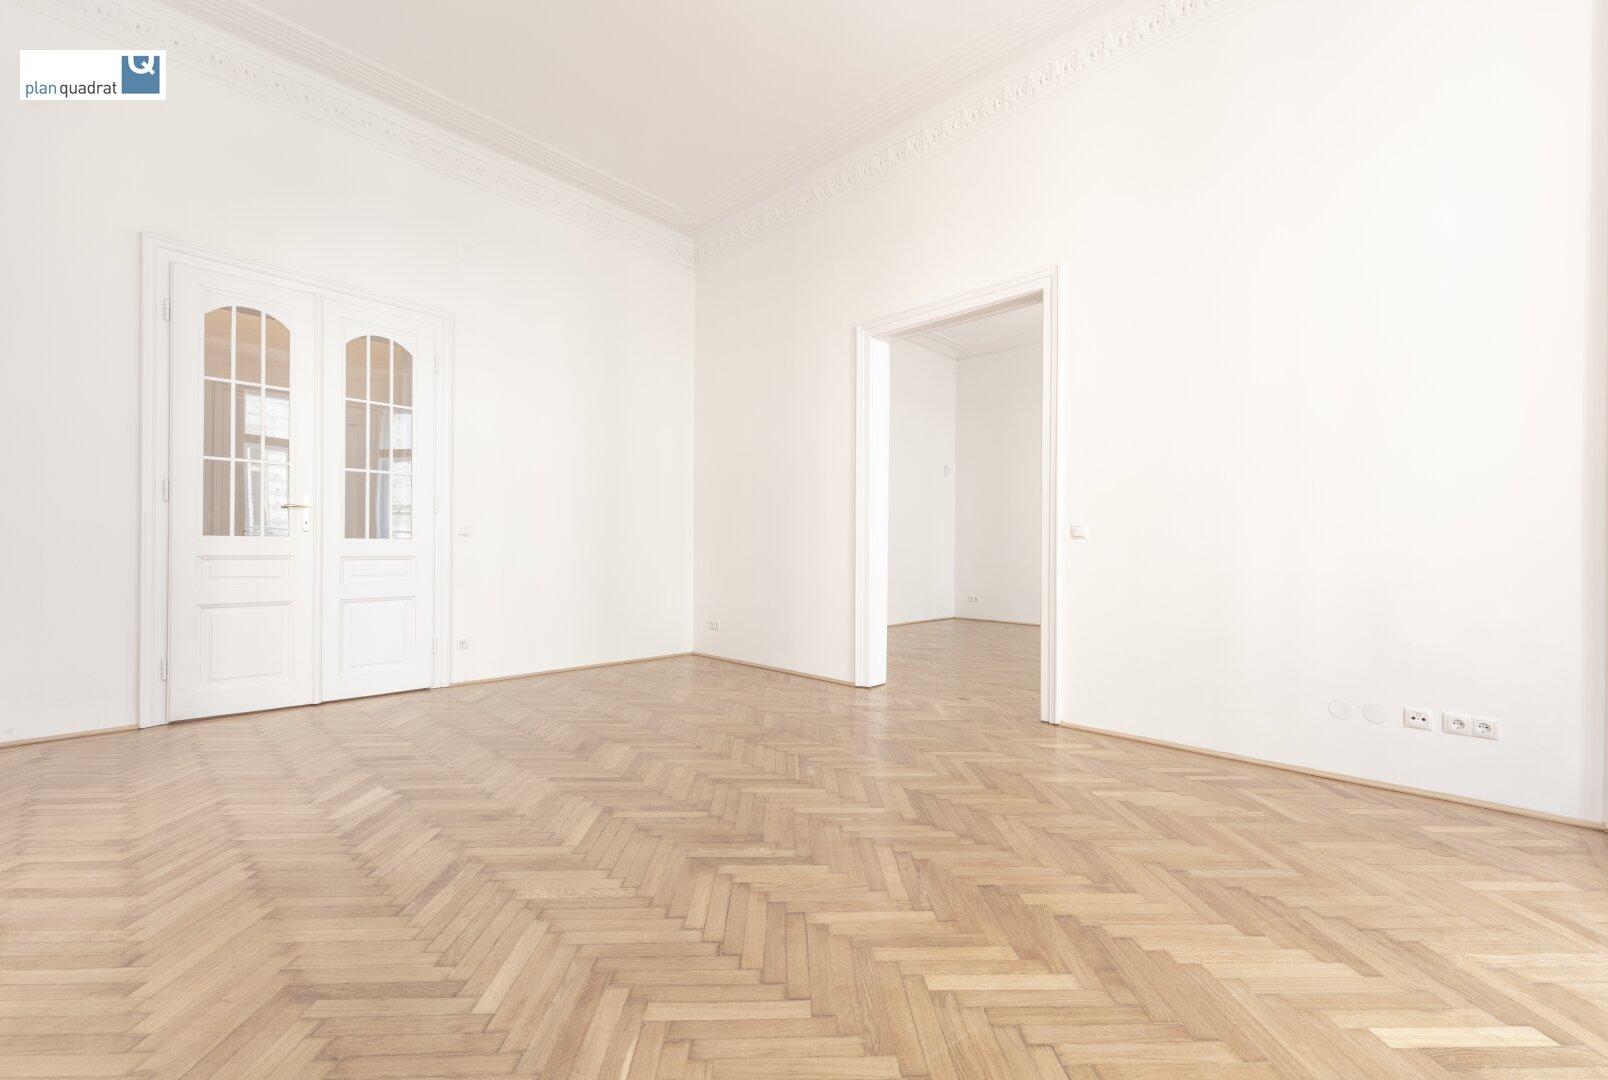 Raum 3 (gem. Grunsrissskizze - ca. 28,40 qm)